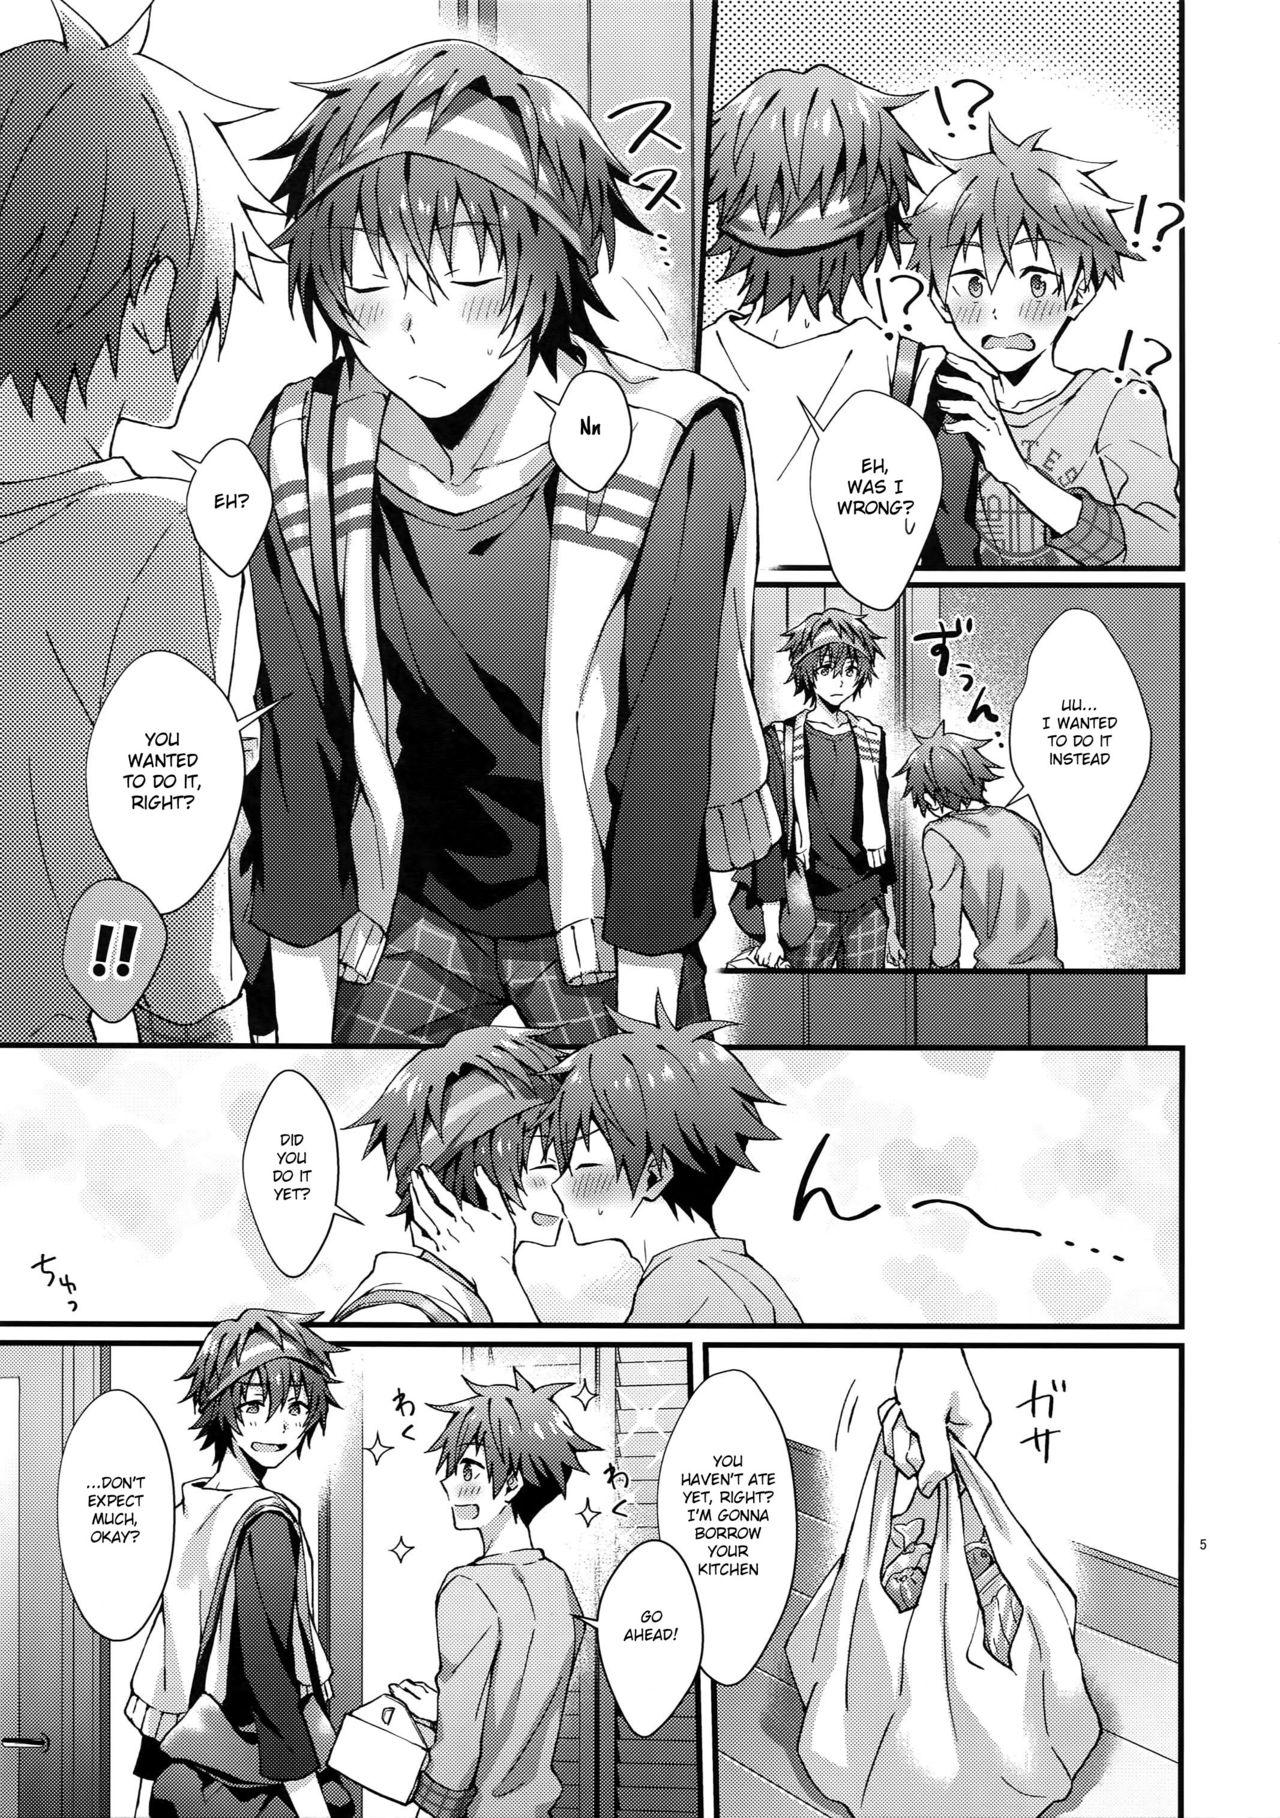 Zenkai! Toshishita Kareshi-Ryoku   Full Power! A Younger Boyfriend's Capability 3